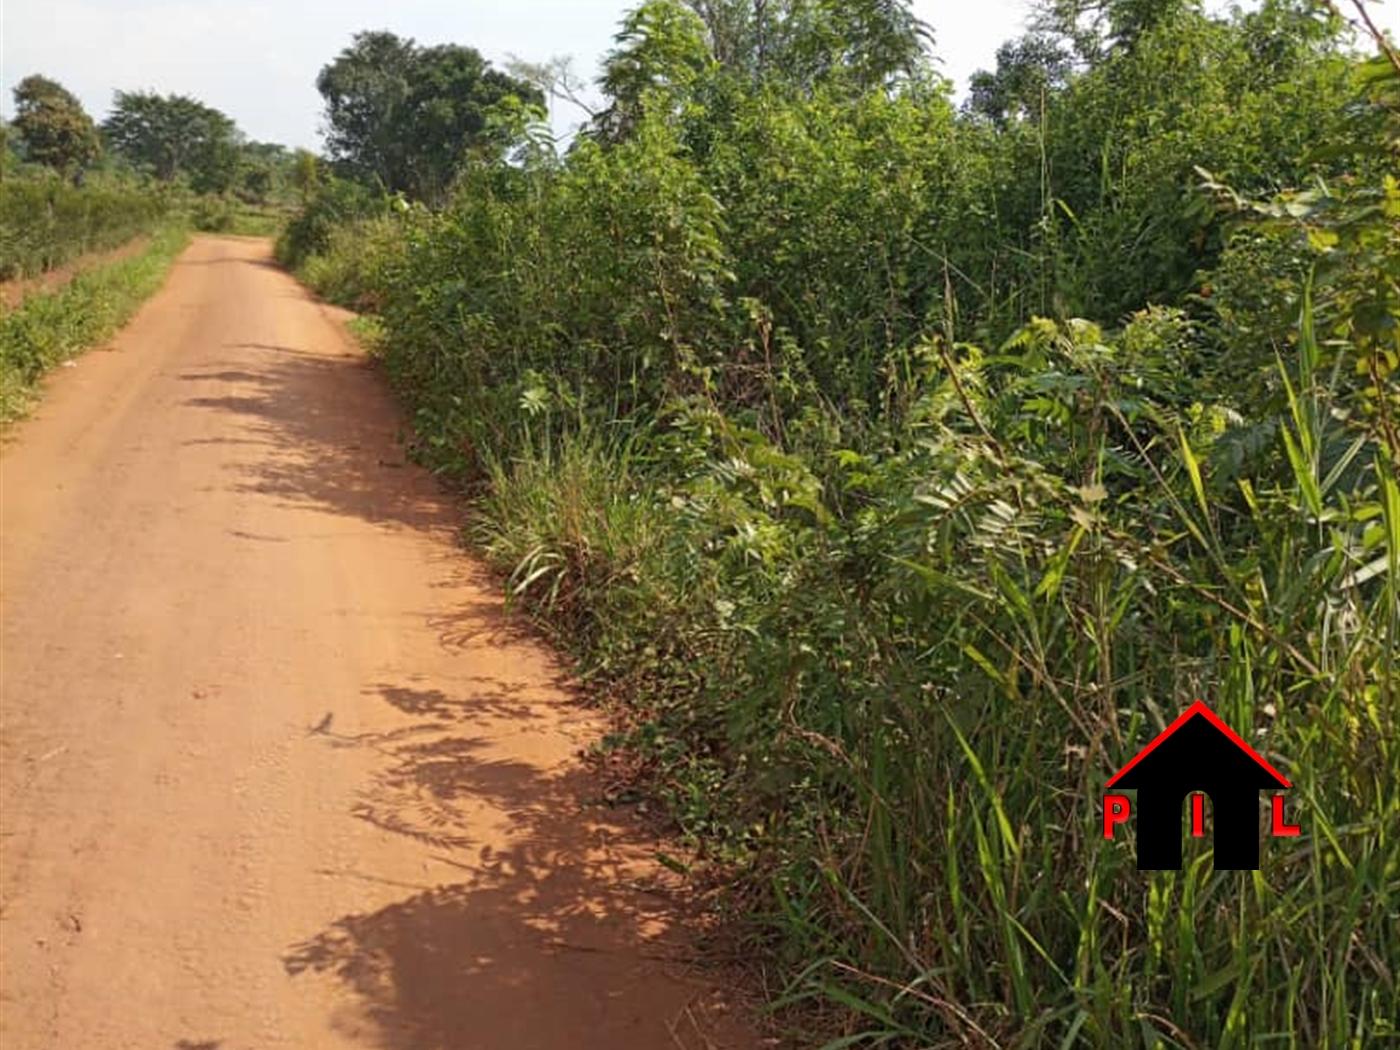 Residential Land for sale in Kitezi Kampala